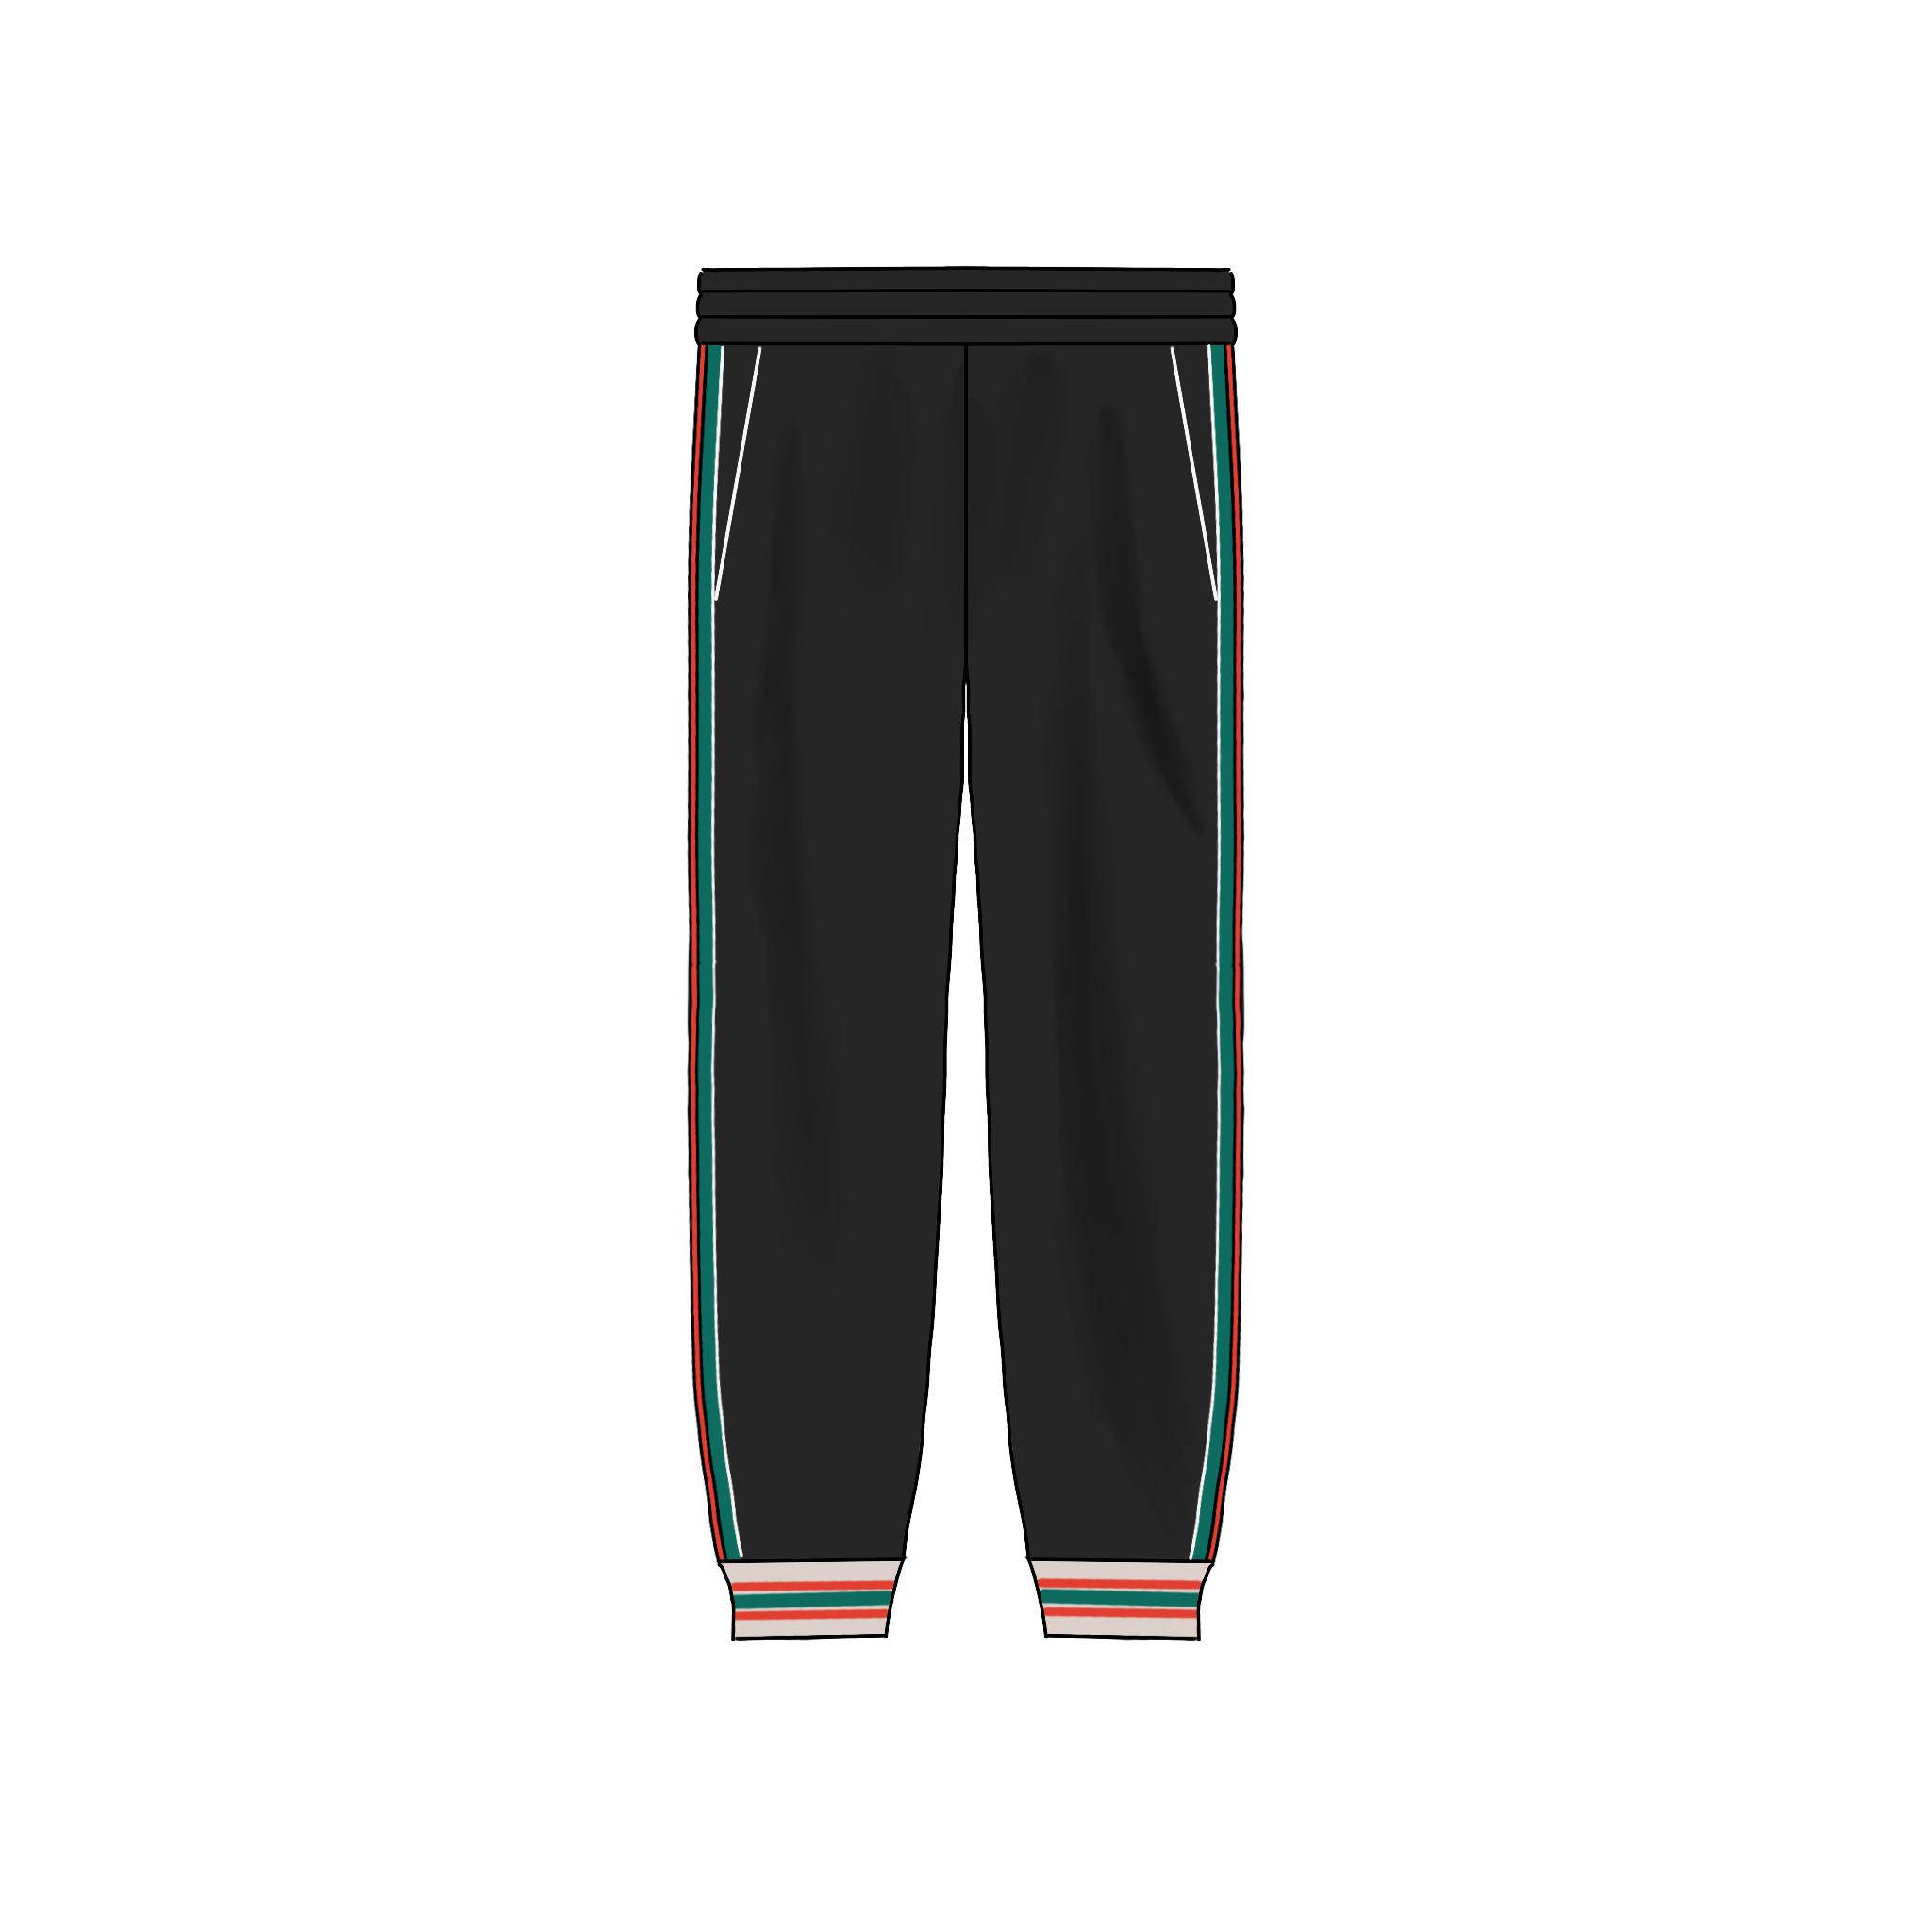 CDIARY HOMME 暗纹针织提花红绿织带运动慢跑休闲长裤